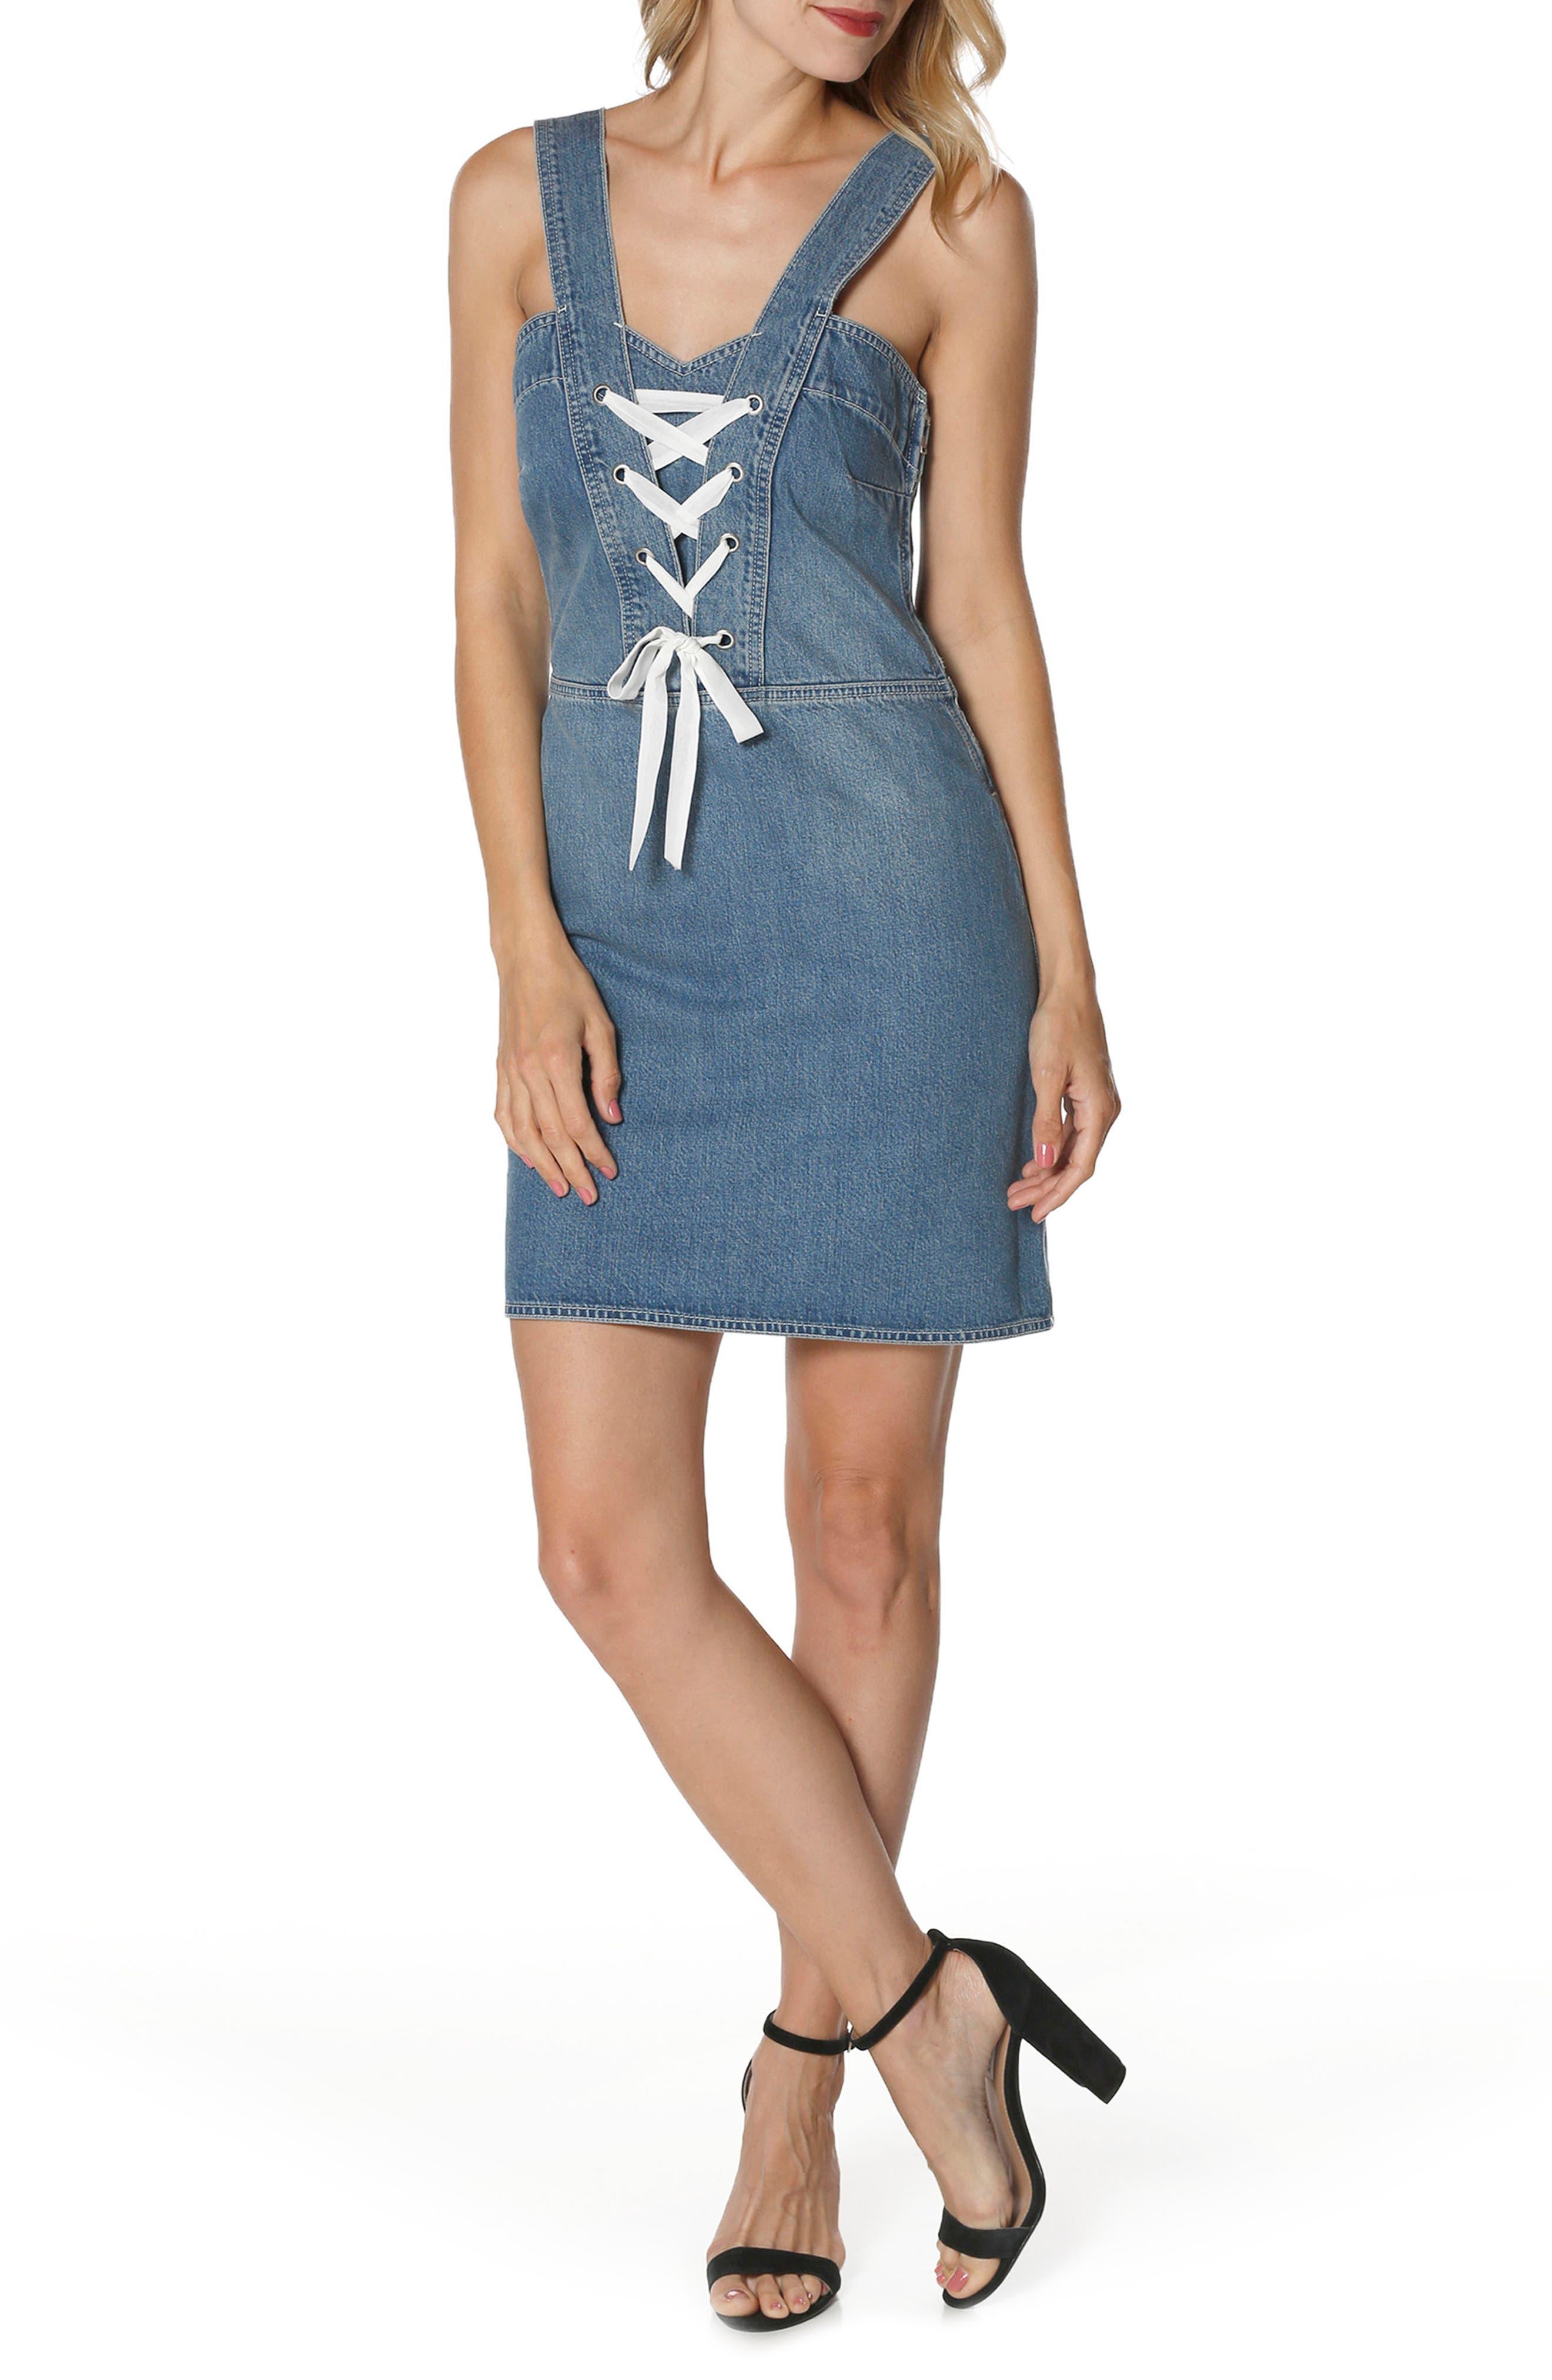 Main Image - PAIGE Tula Lace-Up Denim Dress